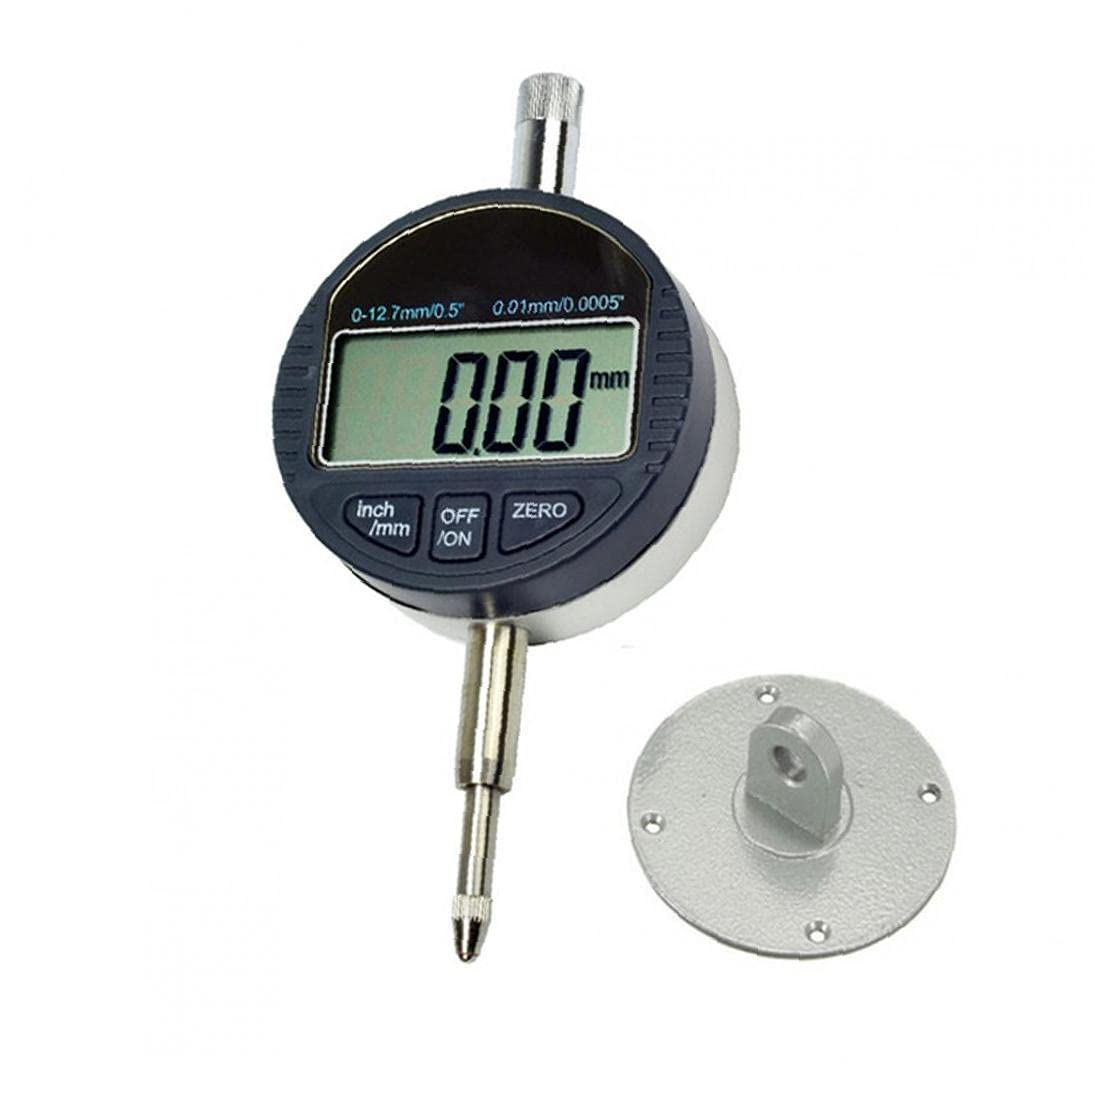 Digital Dial Indicator Fresno Mall 0.01mm Electronic Award Test Gauge R Probe